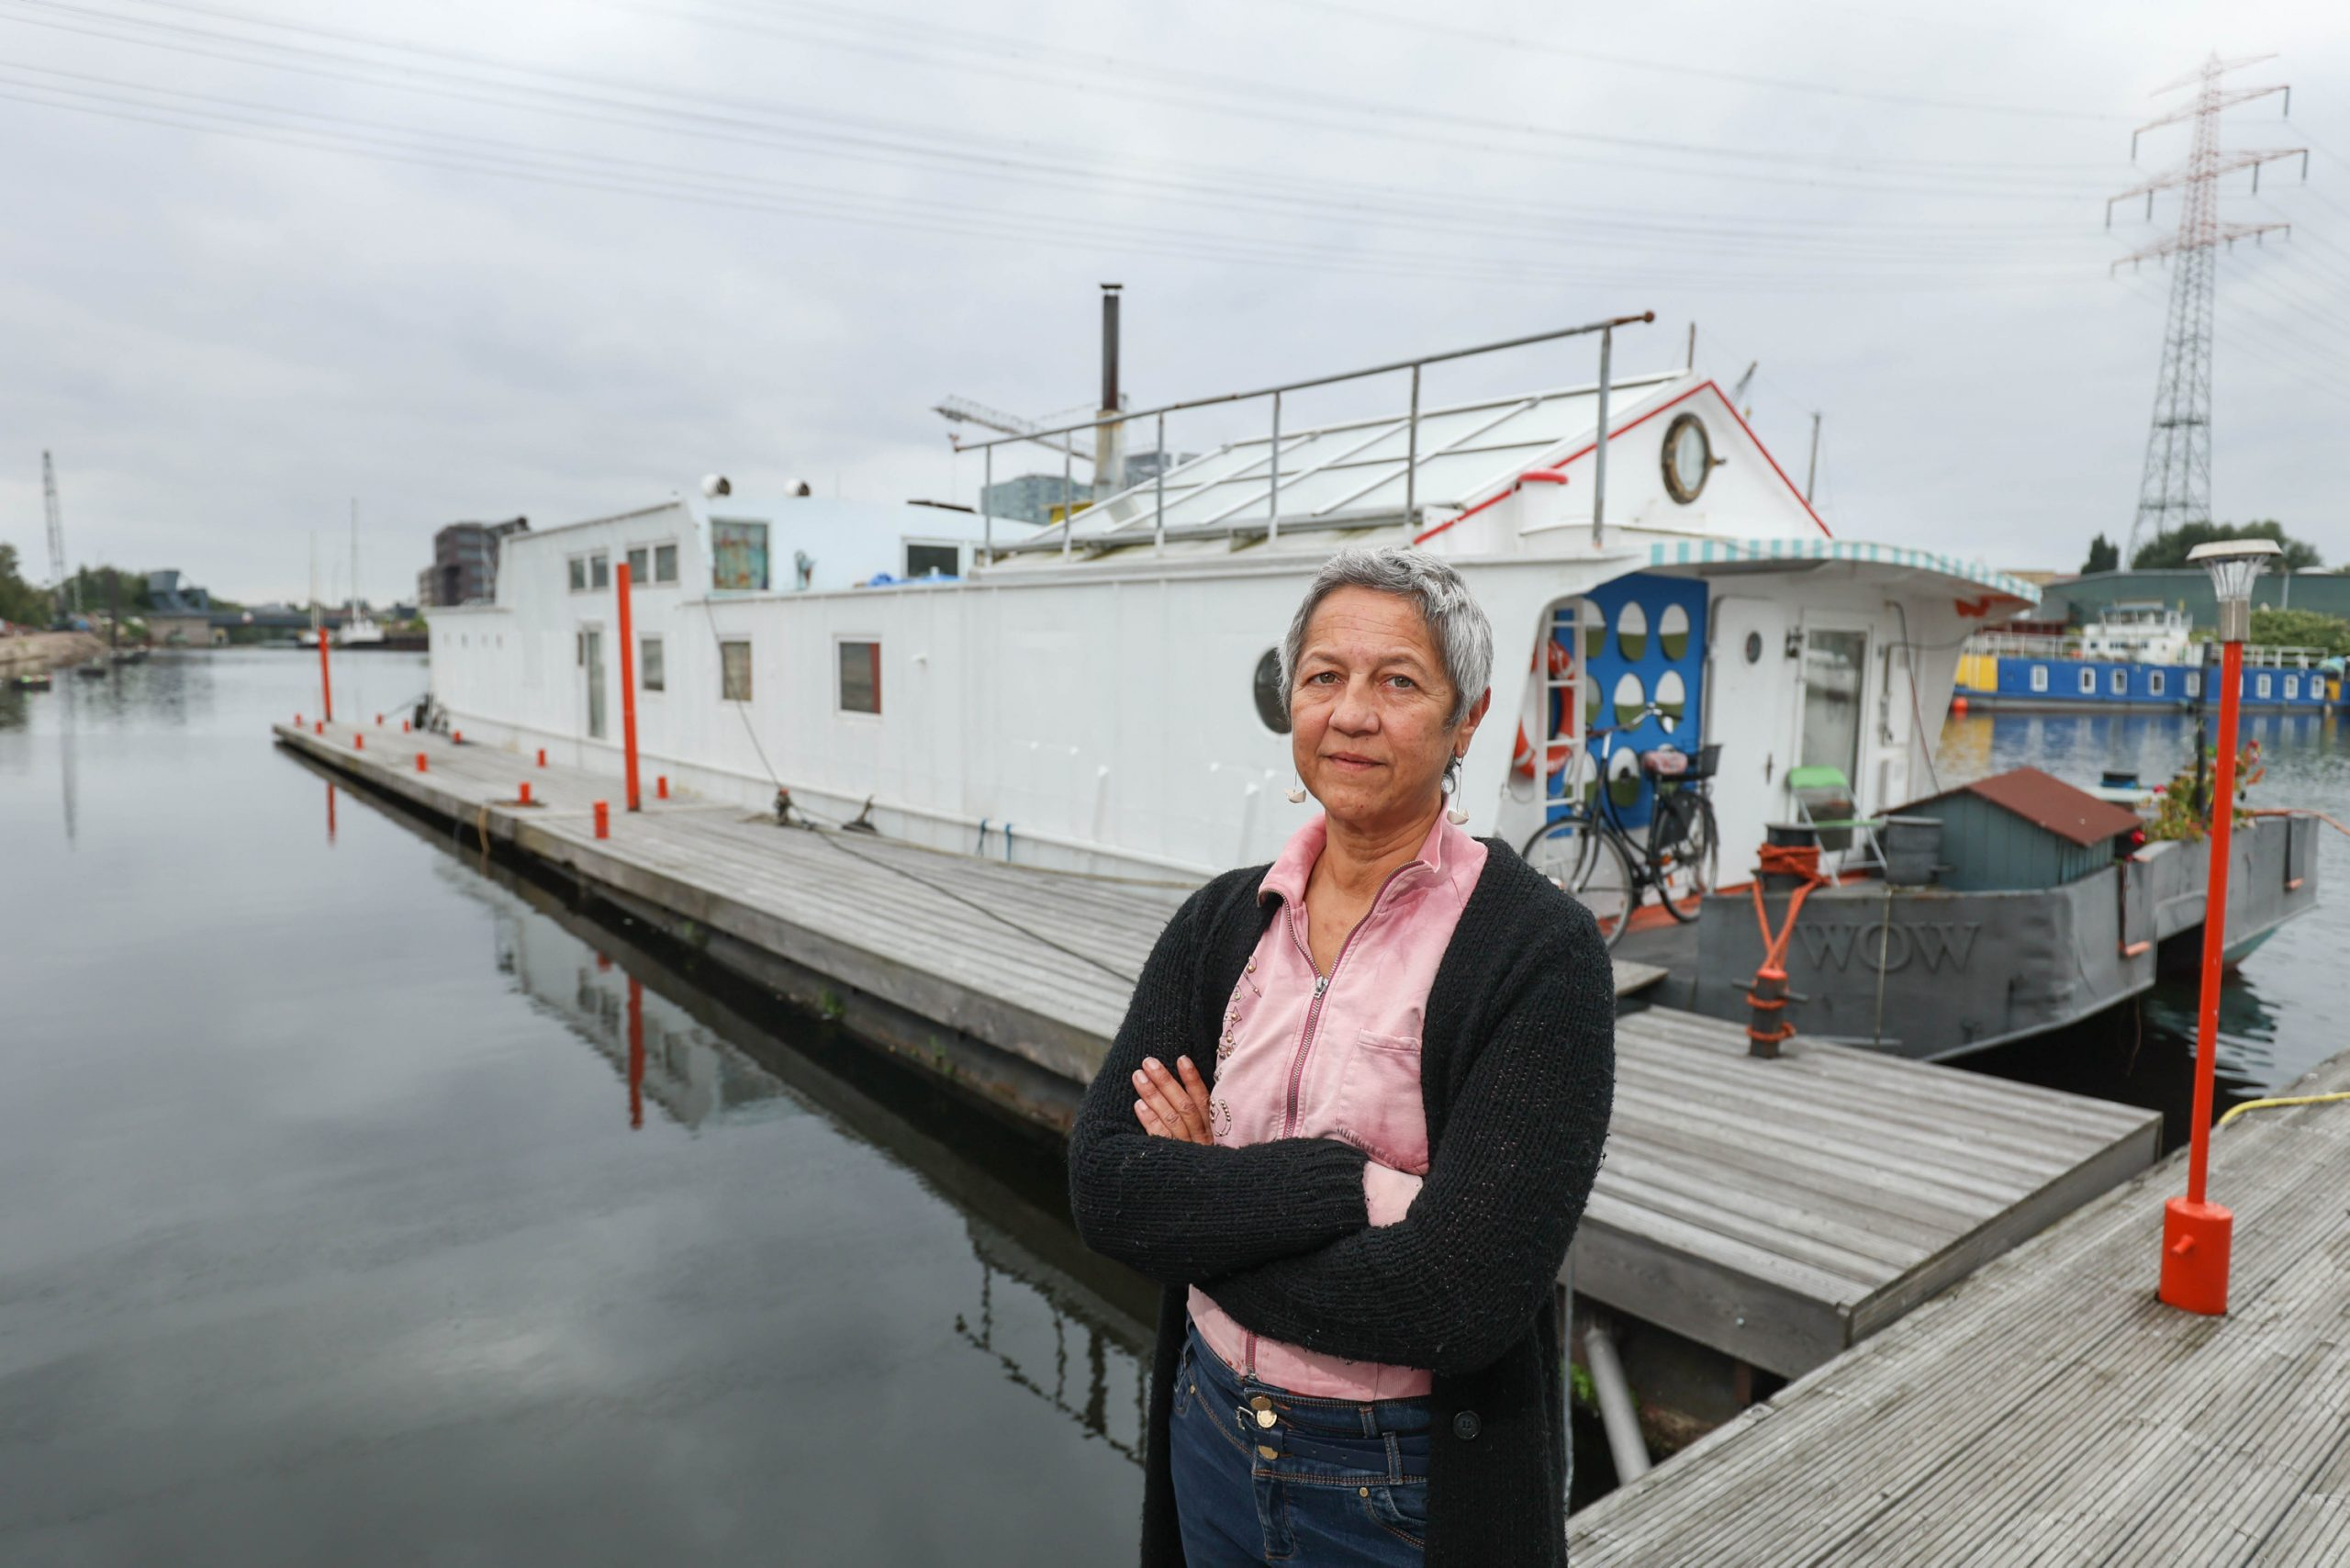 Hamburg kündigt Liegeplatz – Hausboot muss weg, aber wohin?